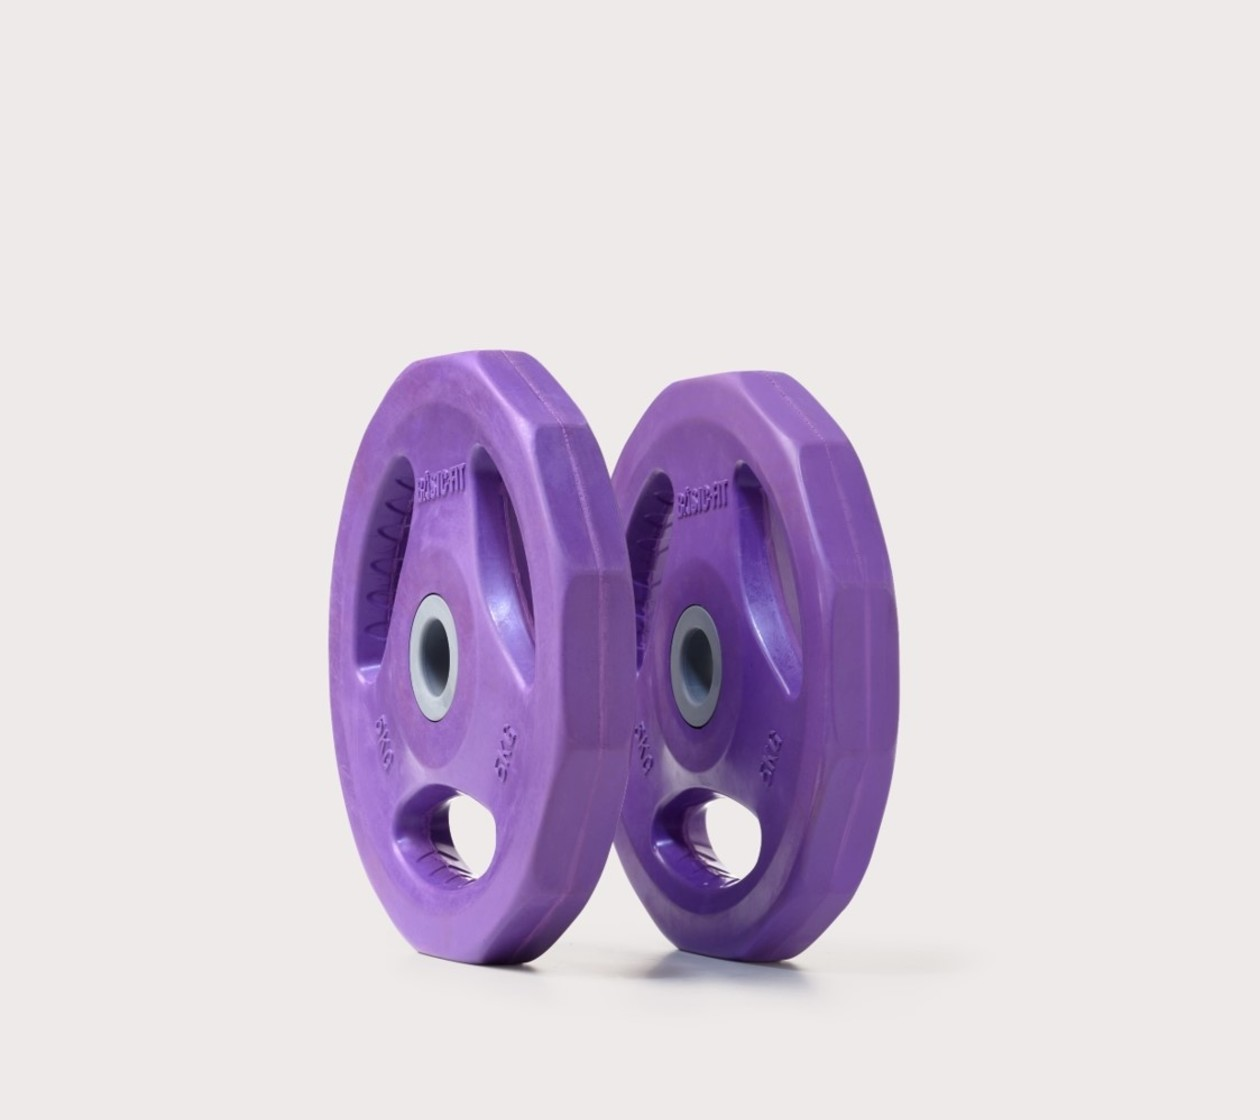 Discos de 5 kg - 2x